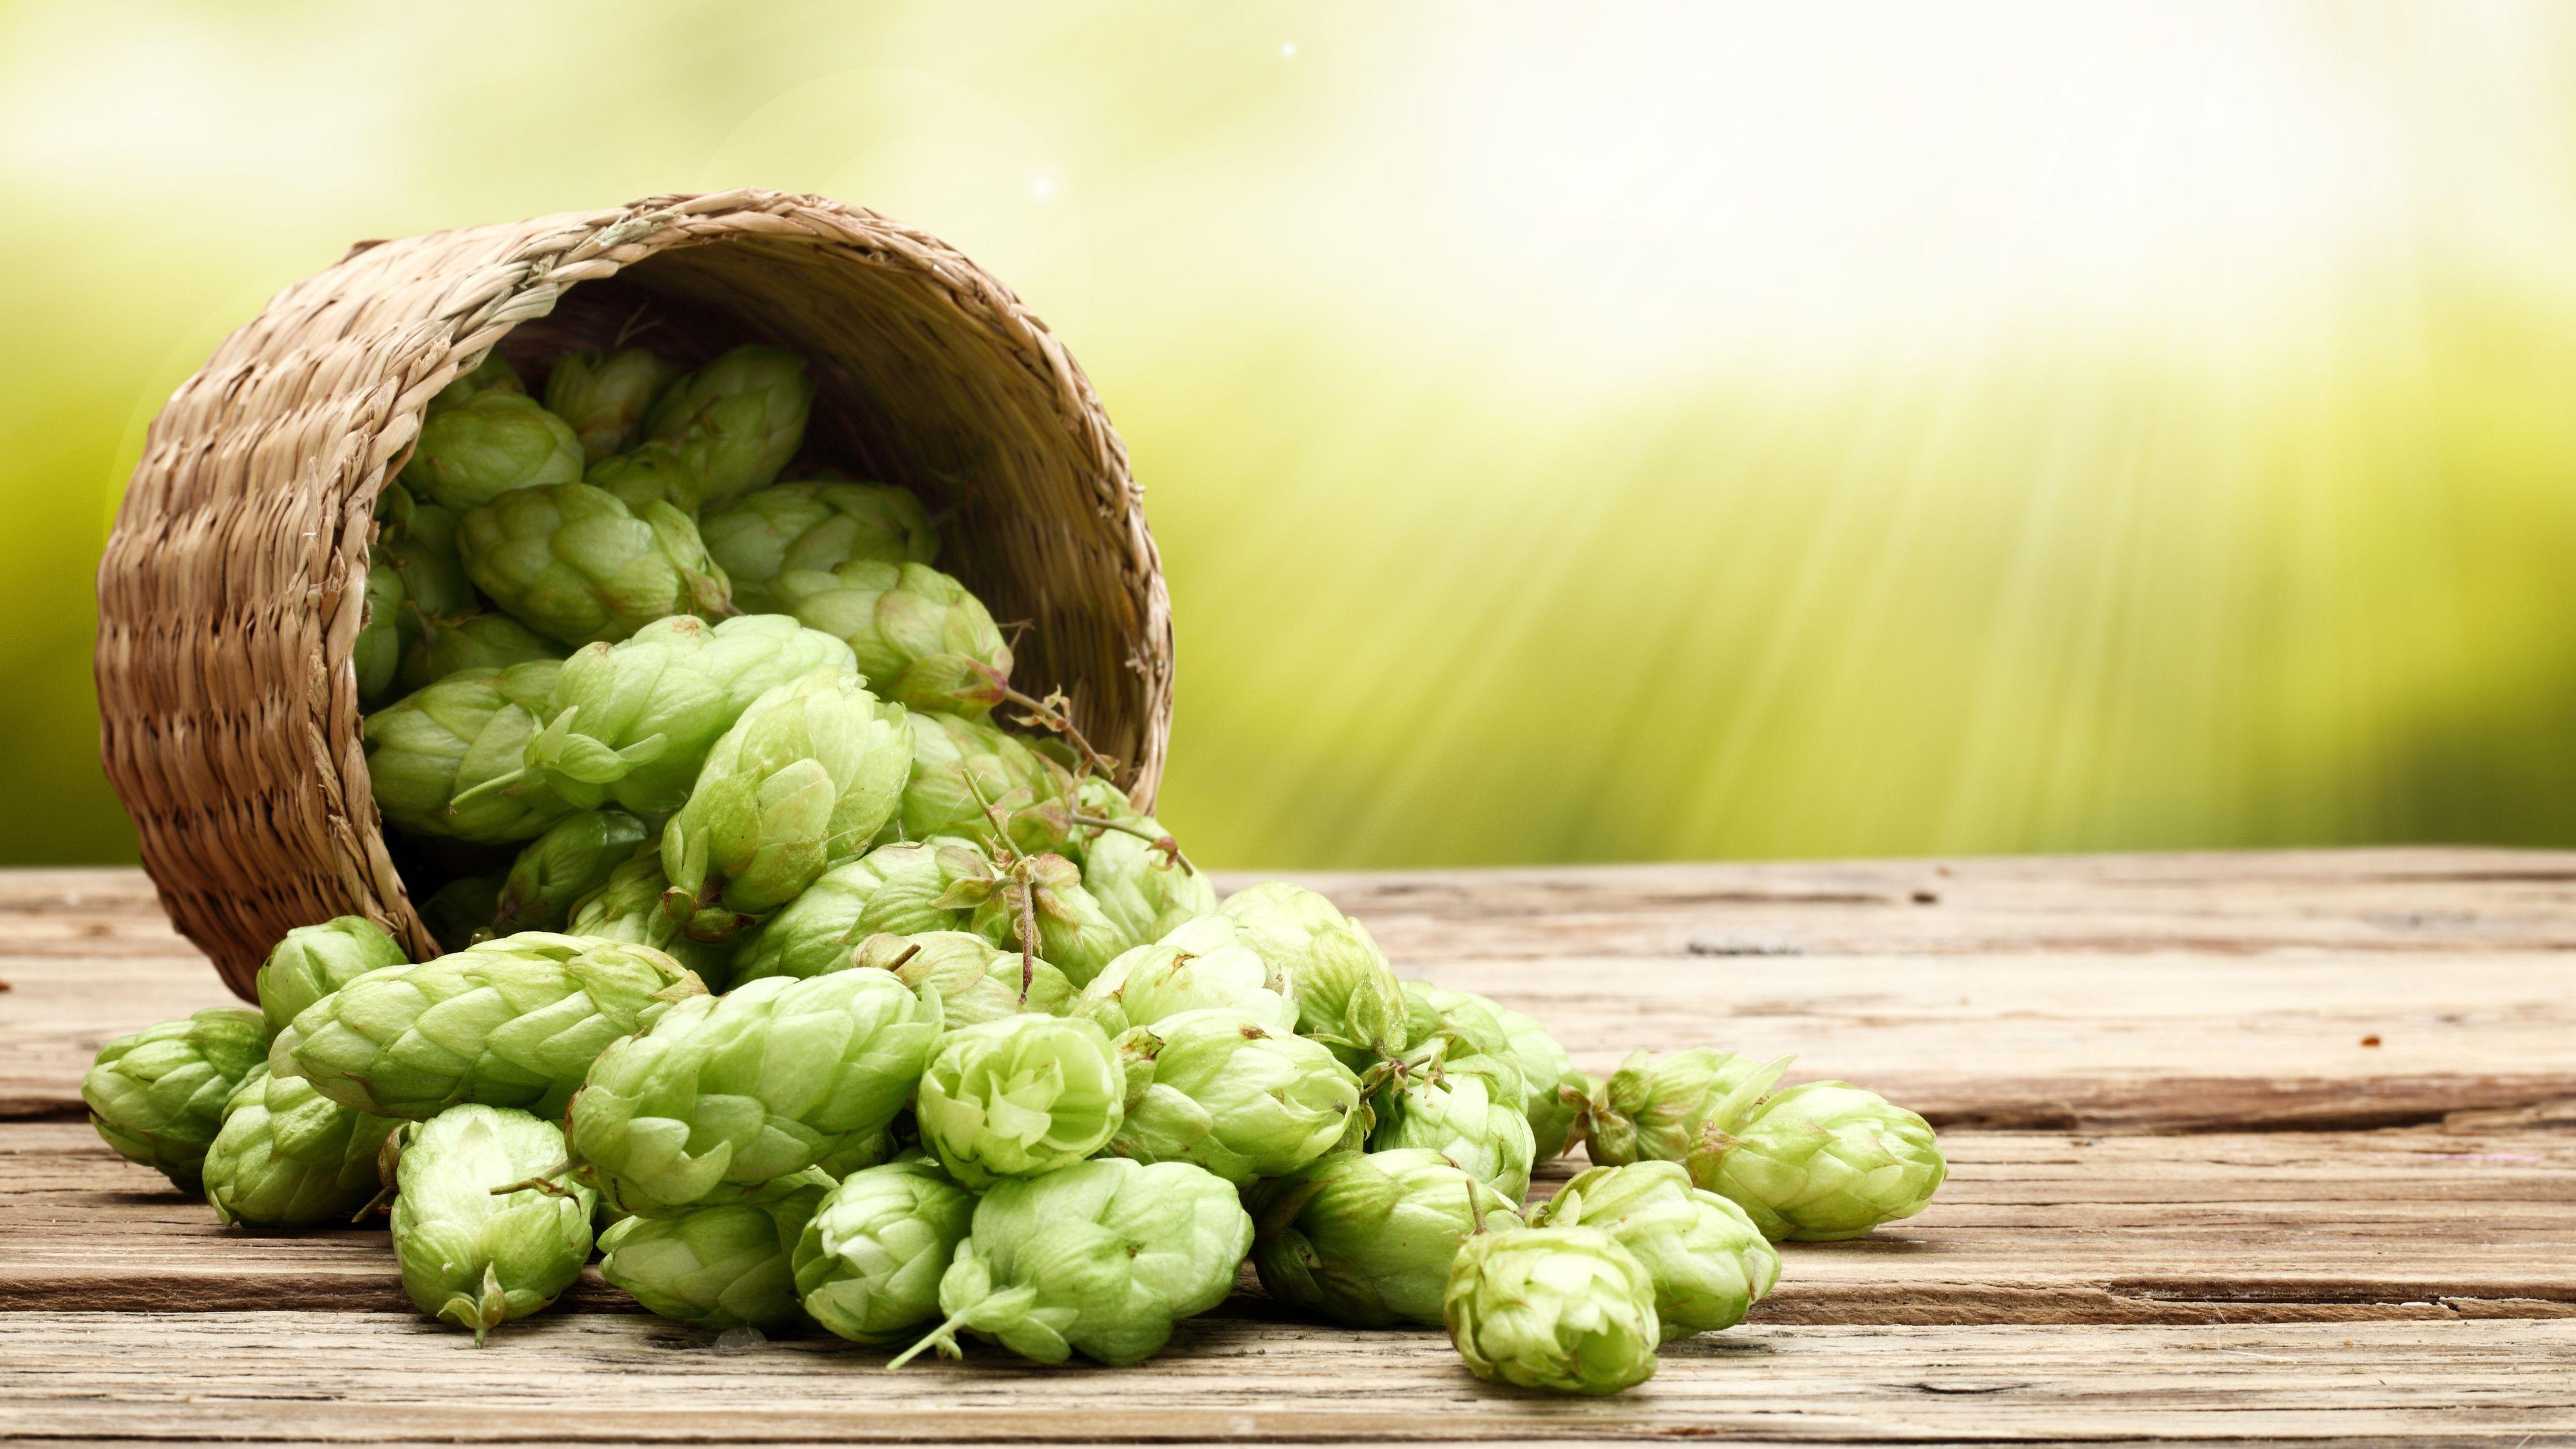 Humle er essensielt i dagens øl.Foto: Shutterstock